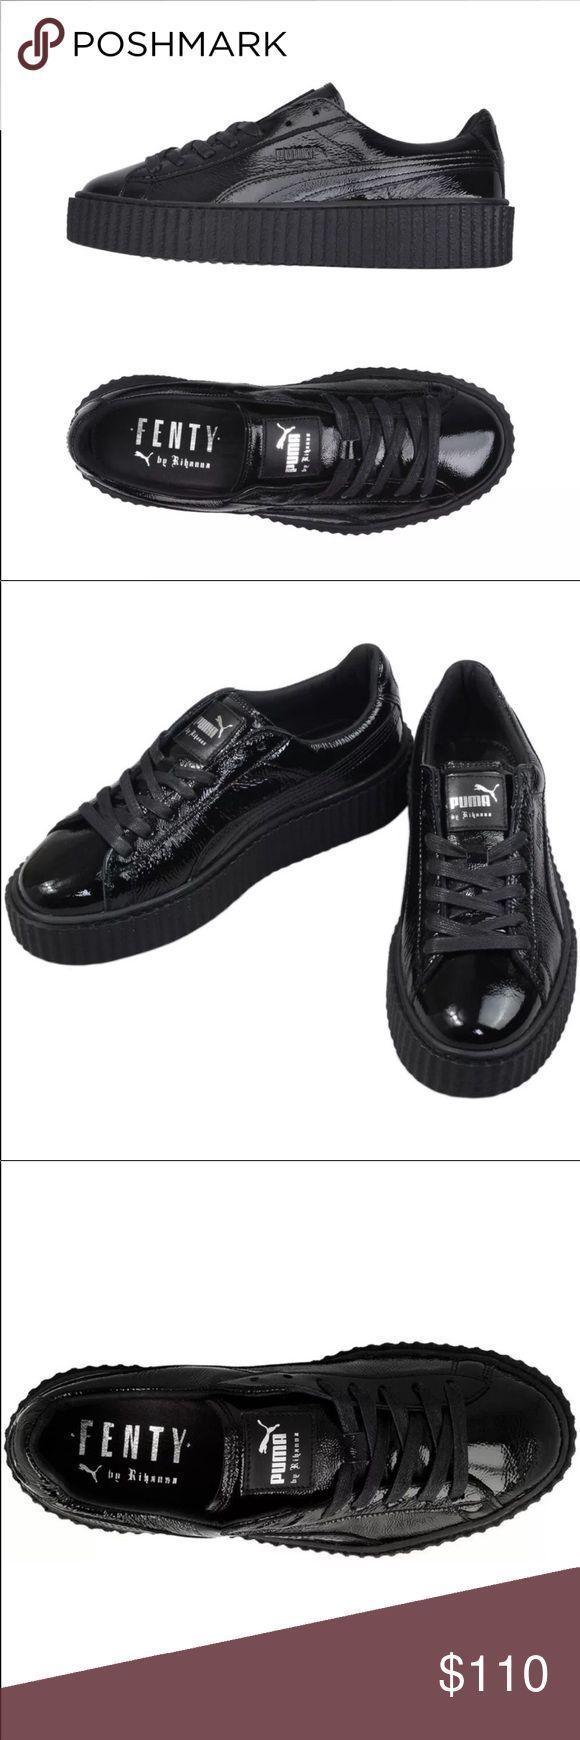 Puma Schuhe Puma Fenty Rihanna Creeper Wrinkled Pvc Schwarz Farbe Schwarz Creeper Farbe Fenty P In 2020 Pumas Shoes Rihanna Creepers Black Platform Shoes